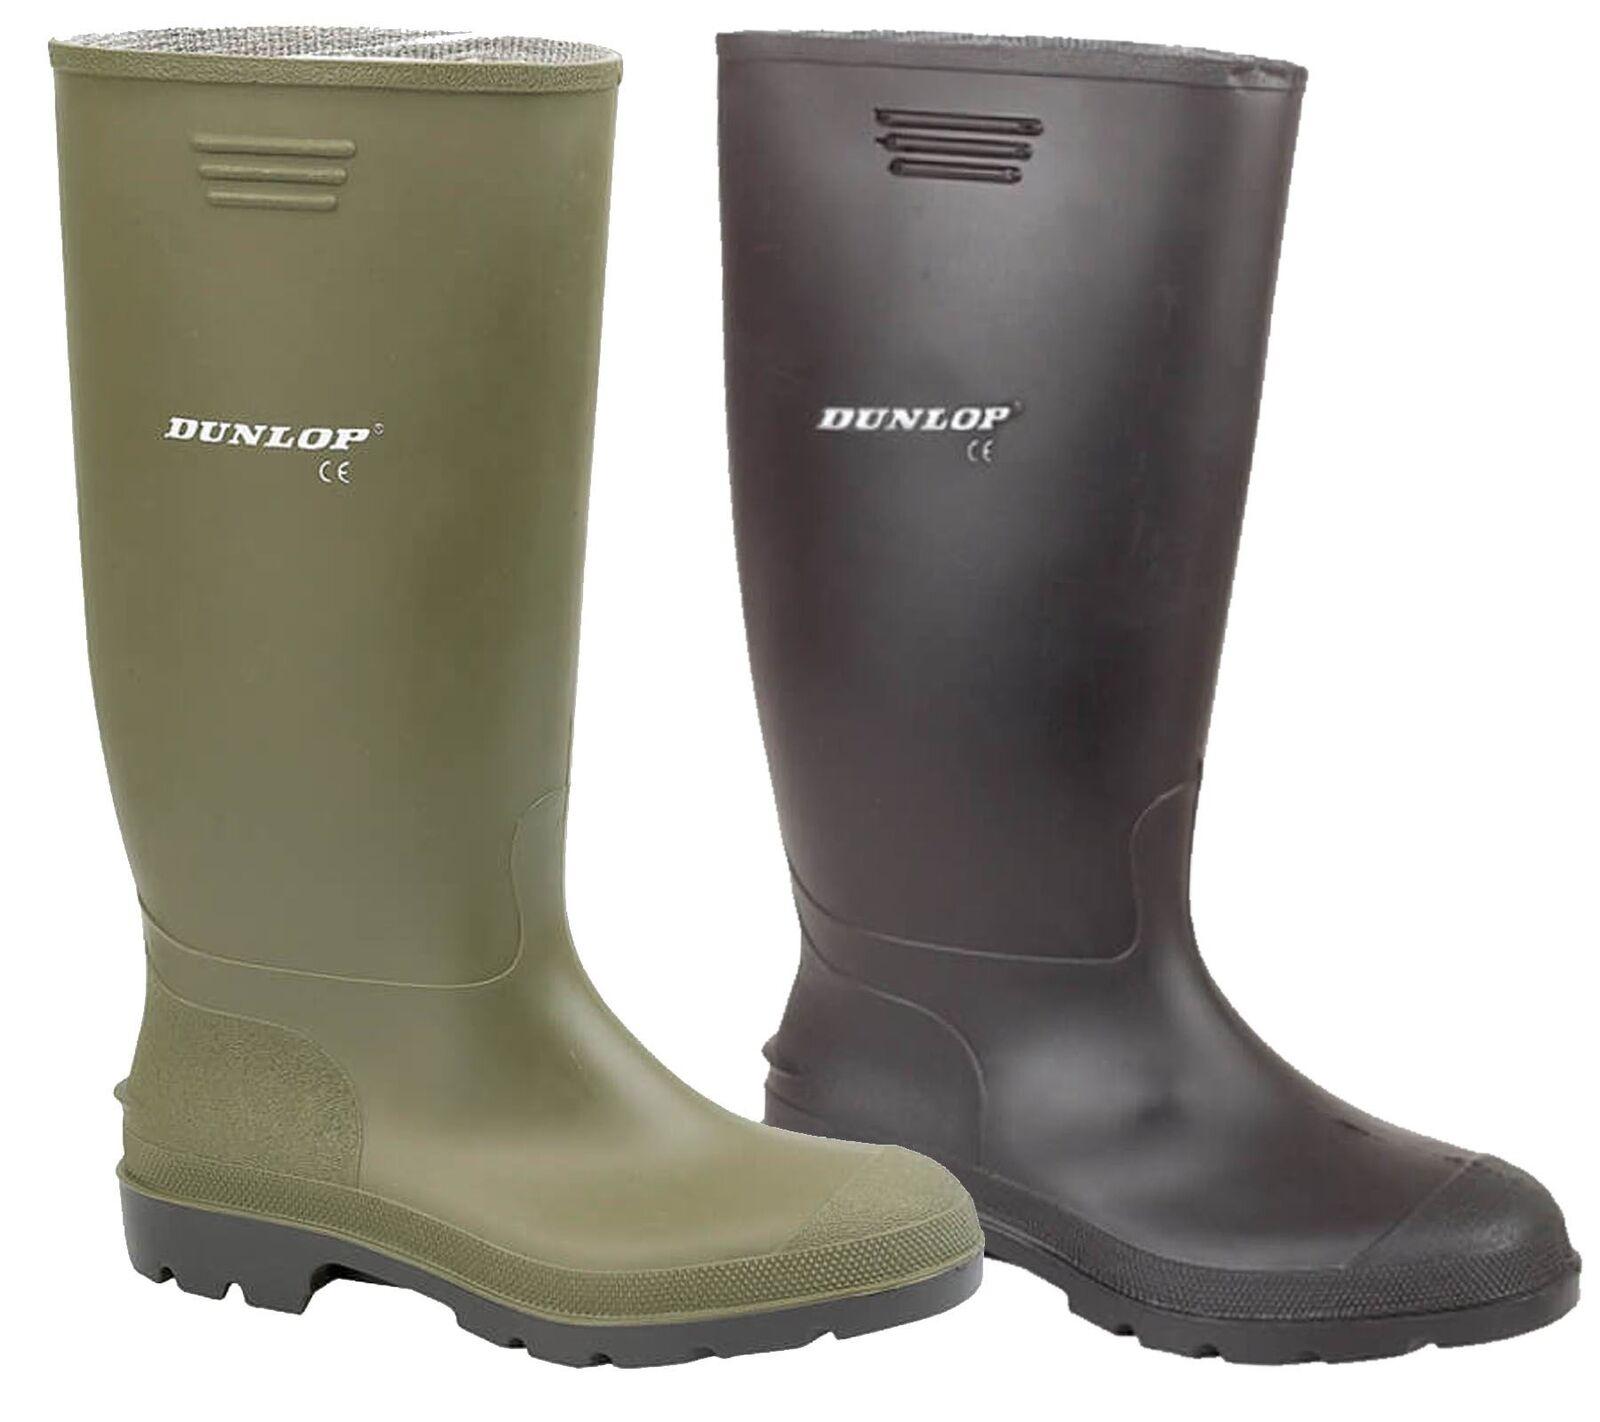 Mens & Wellies Ladies Dunlop Wellingtons Mens Wellies & Womens Rain Shoes 7c01b7